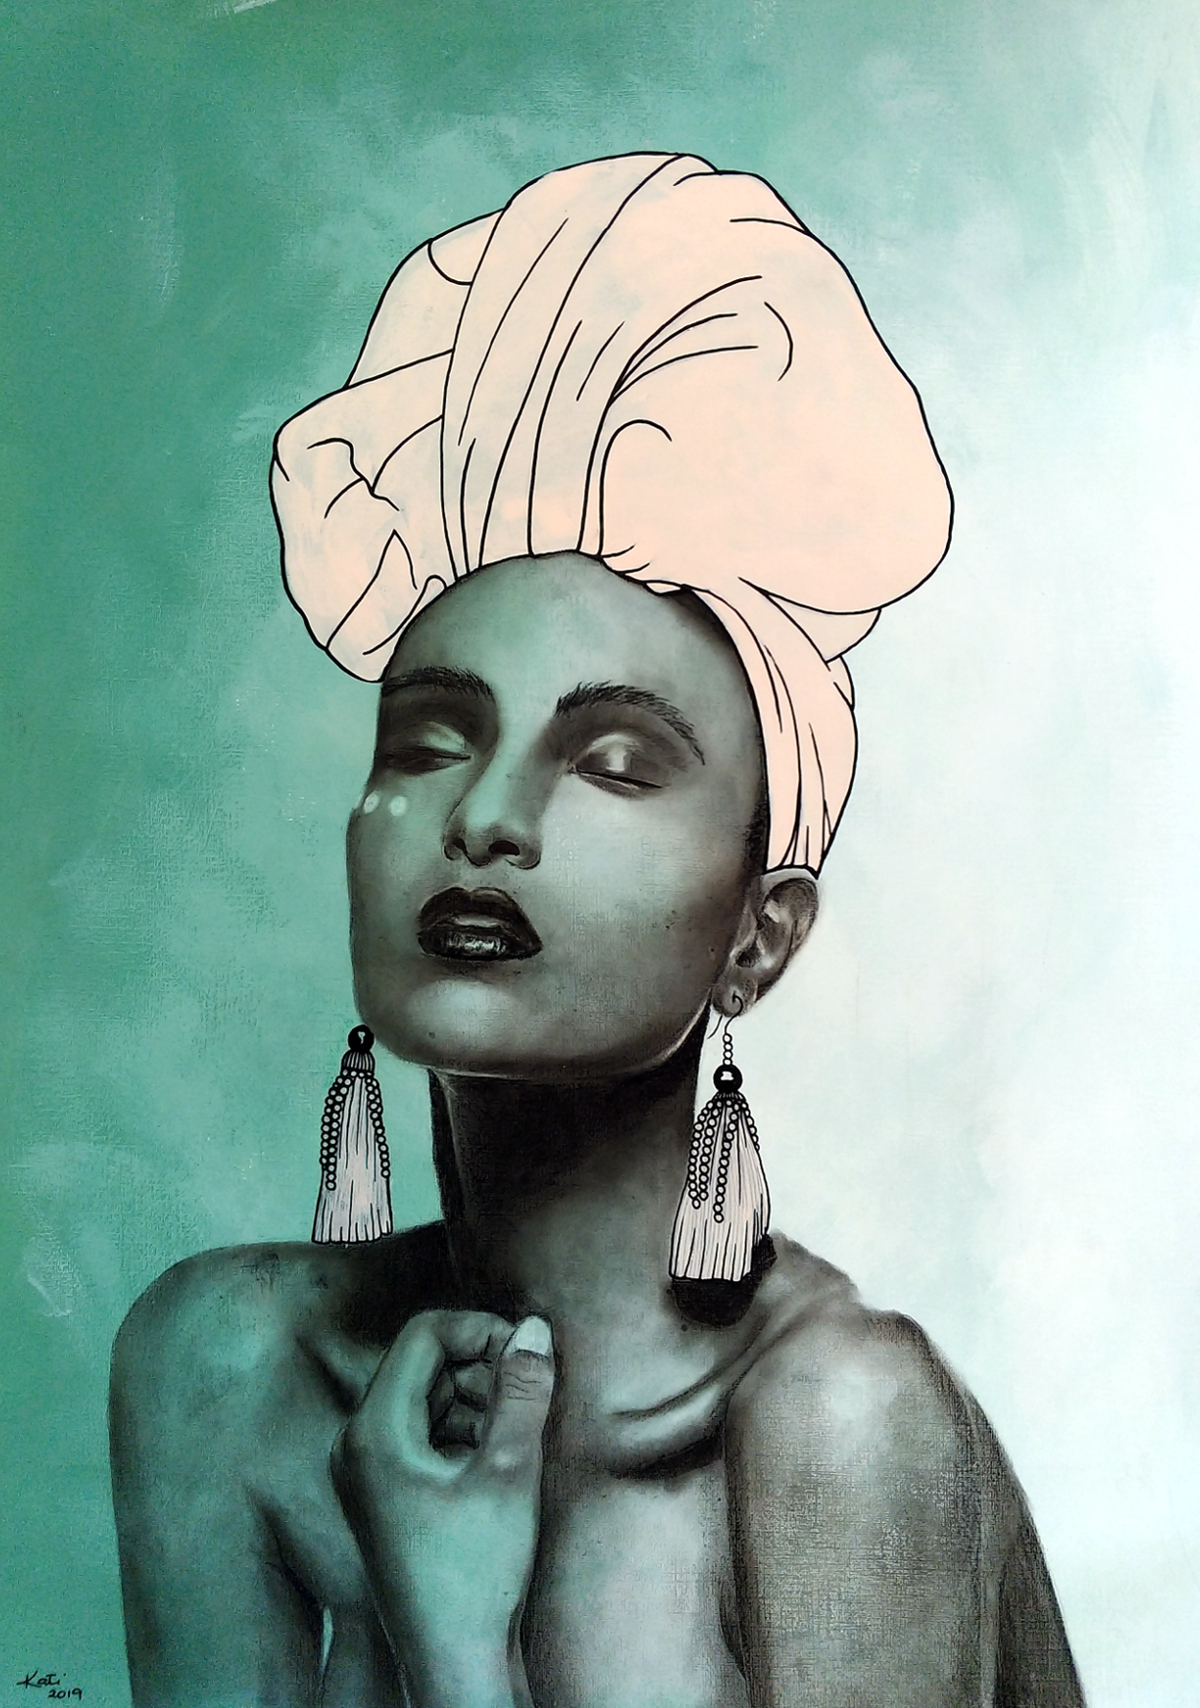 Faith Ethnic Art By Kati Garrett Filho Main